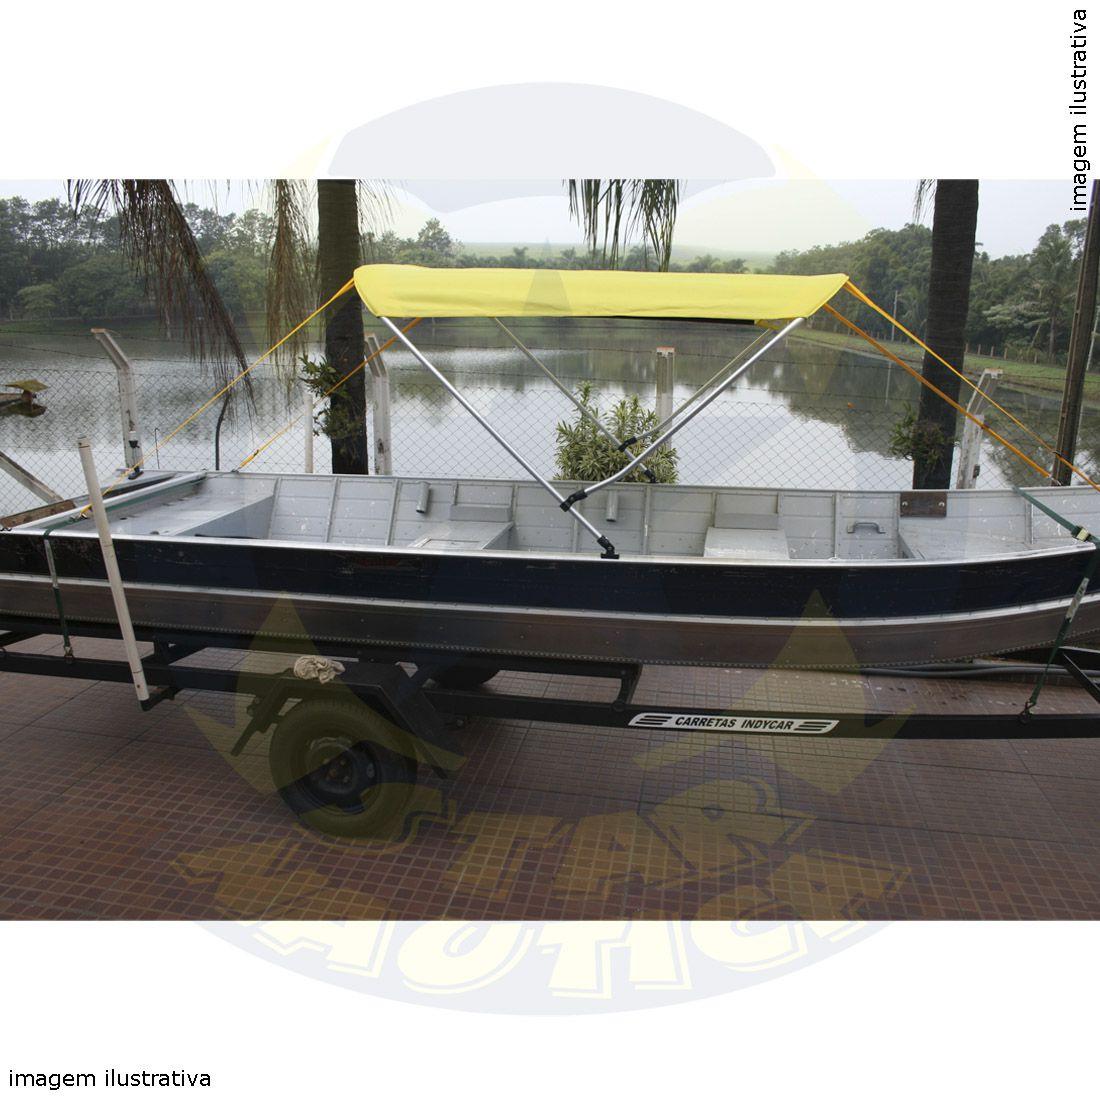 Capota Toldo Barco de Alumínio Boca até 1,60 Poliester 2 Arcos Tubo 7/8